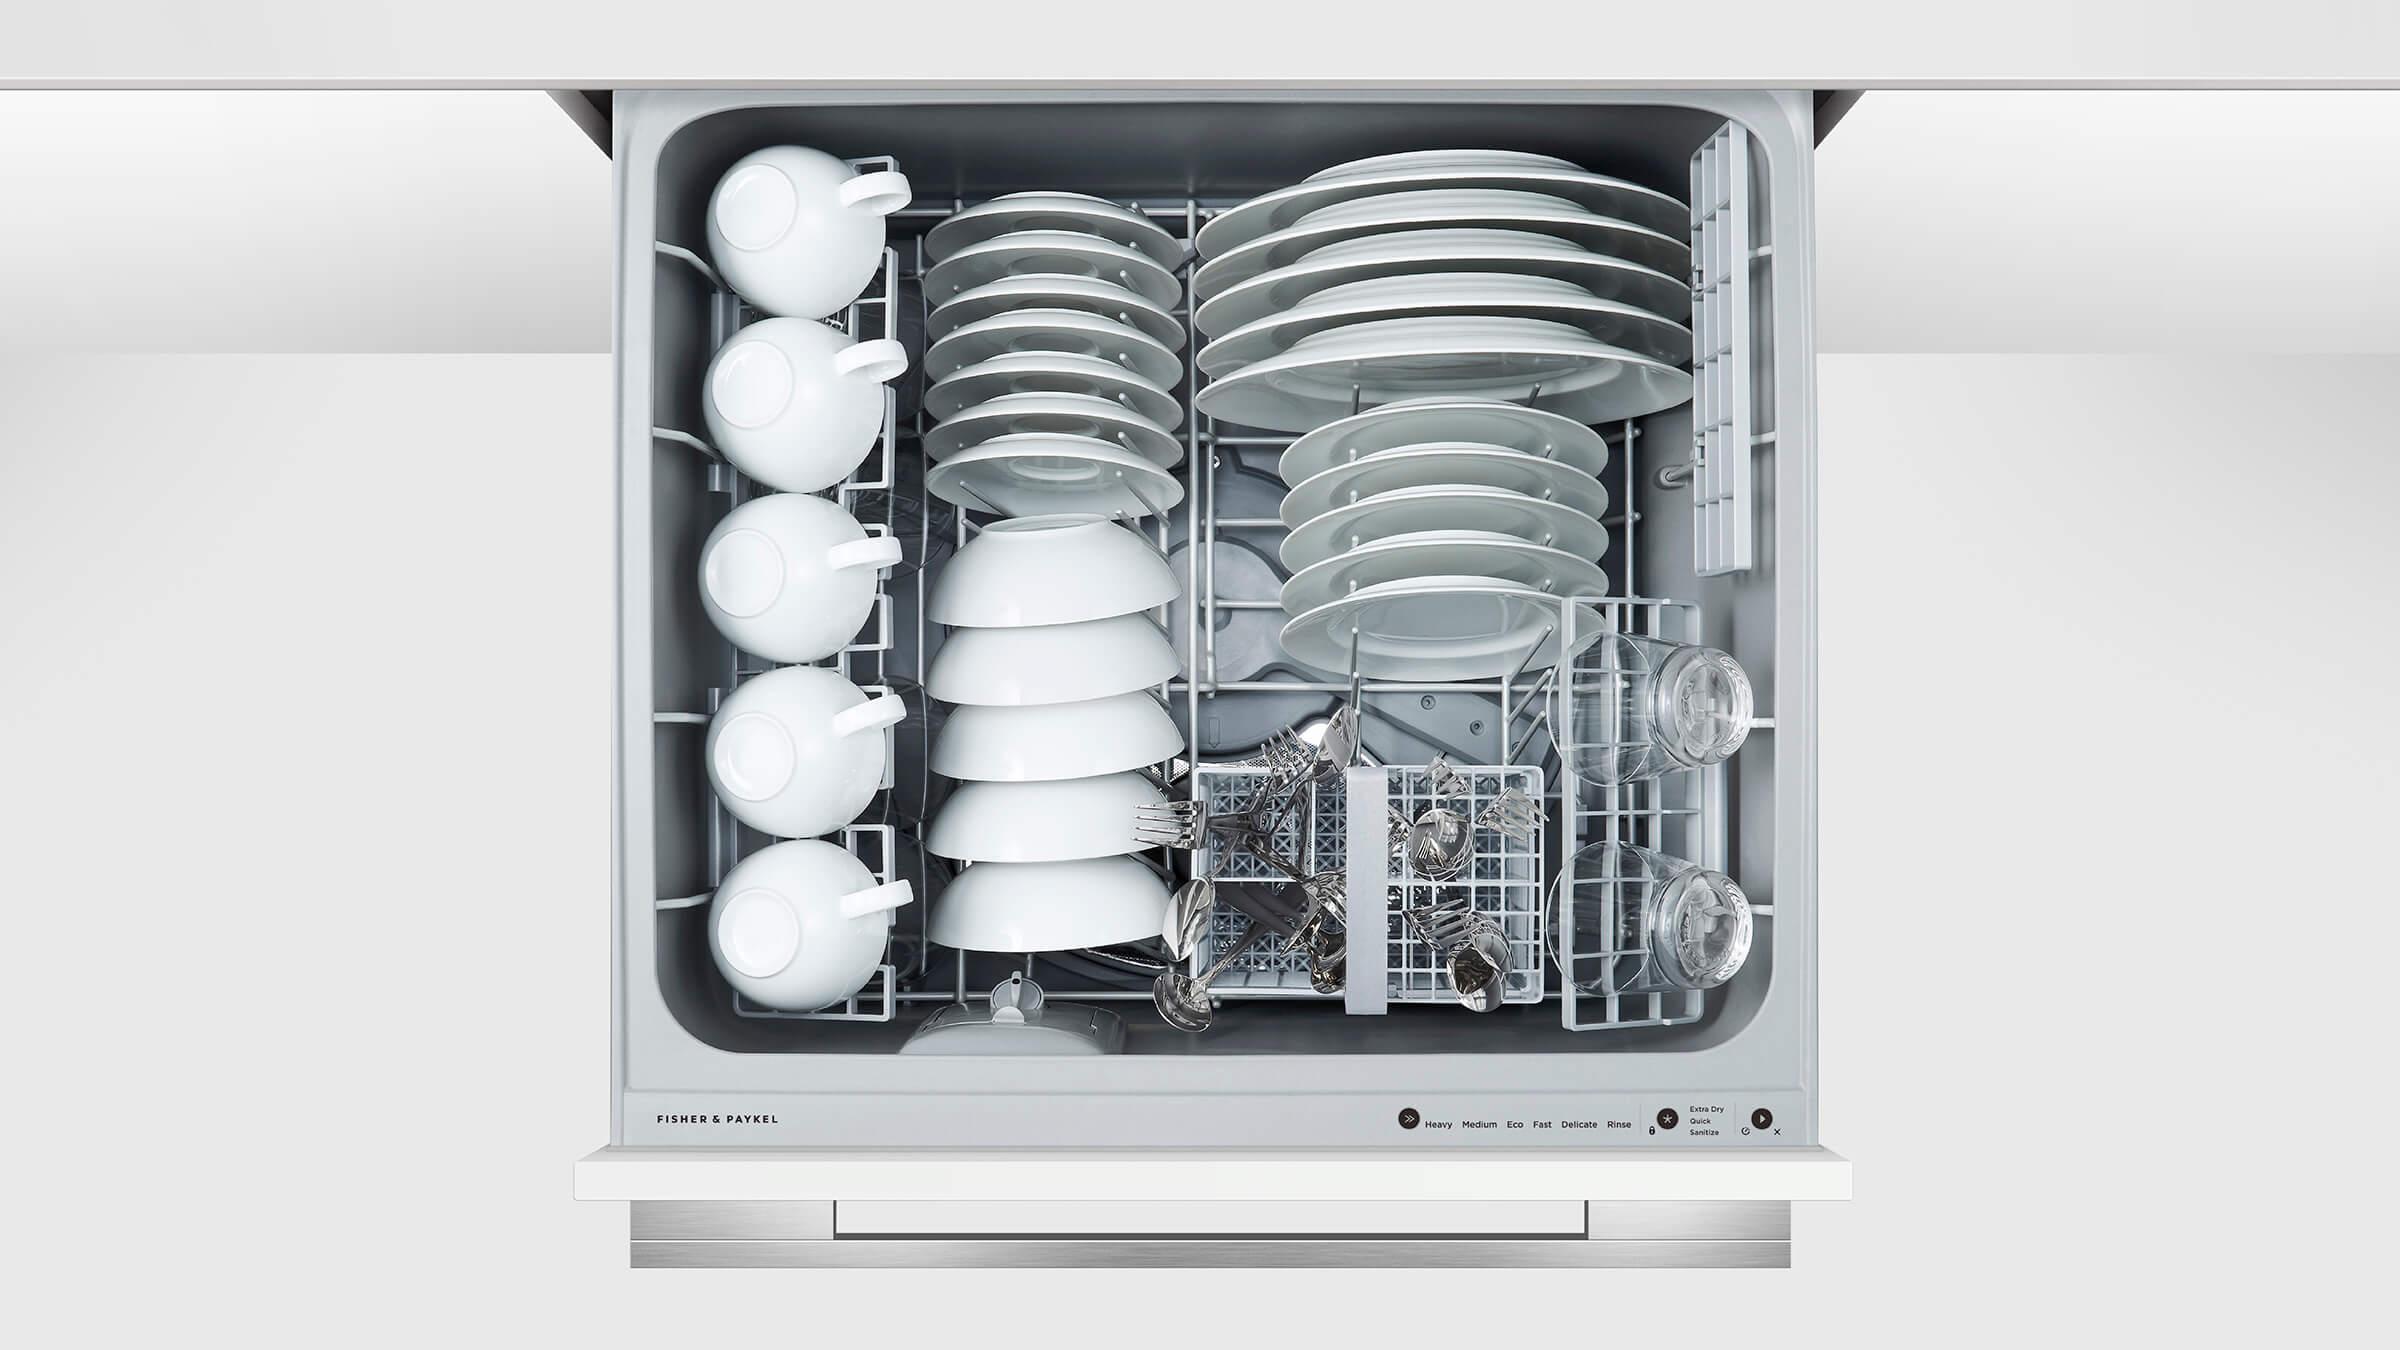 dd24di9 n panel ready double dishdrawer dishwasher fisher and rh fisherpaykel com